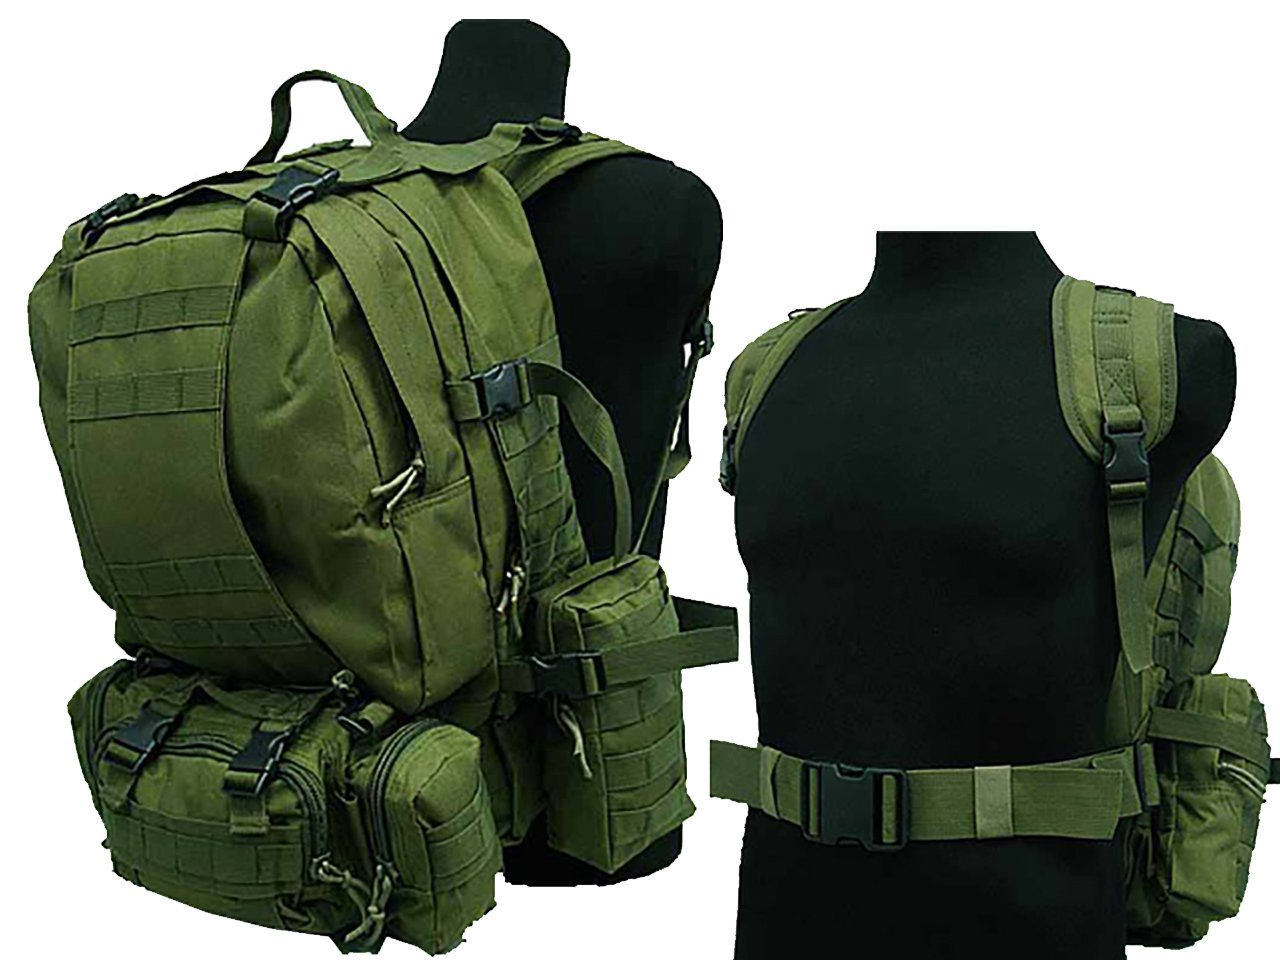 50lタクティカルMOLLE Assault Military Rucksacksバックパックハイキングキャンピングバッグod B06XHXT6LQ